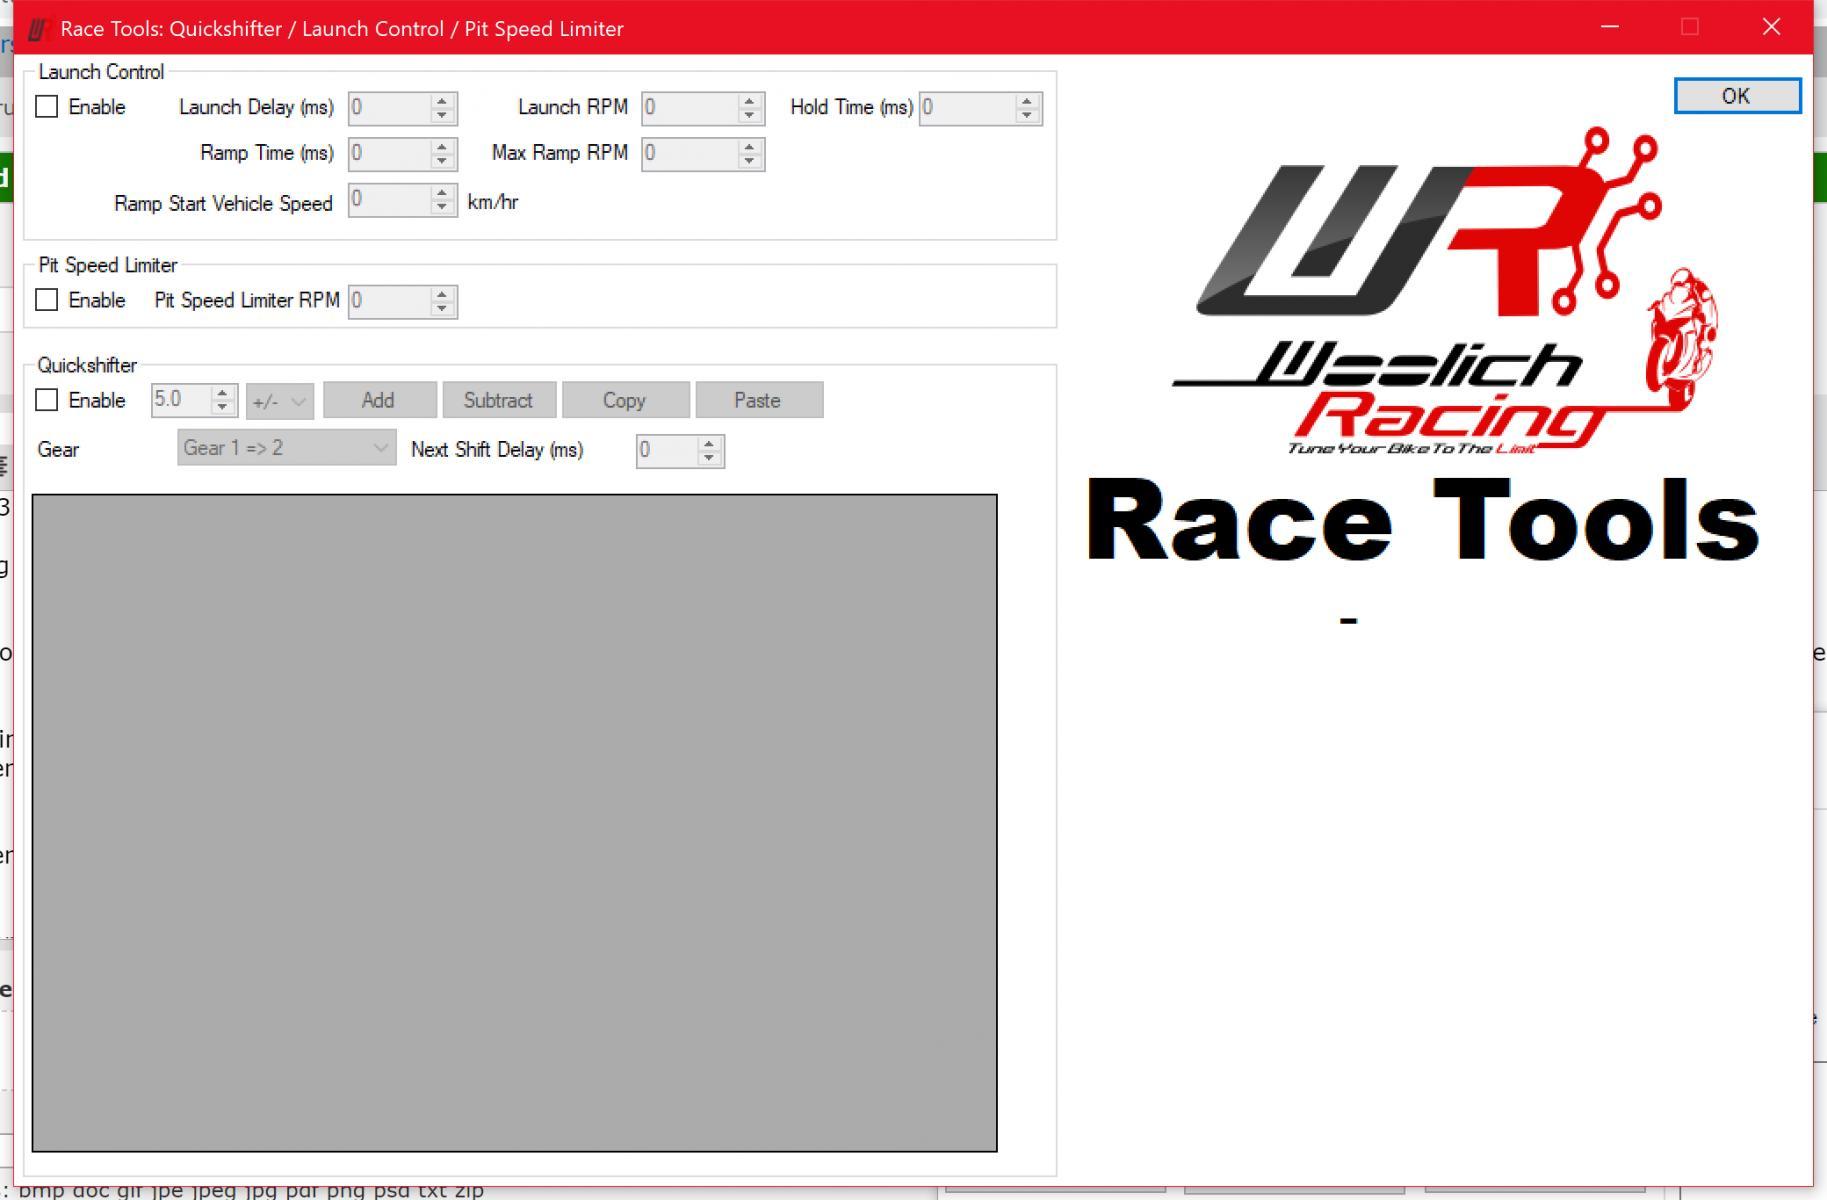 ECU flash using Woolich Racing software - Page 12 - Kawasaki Ninja